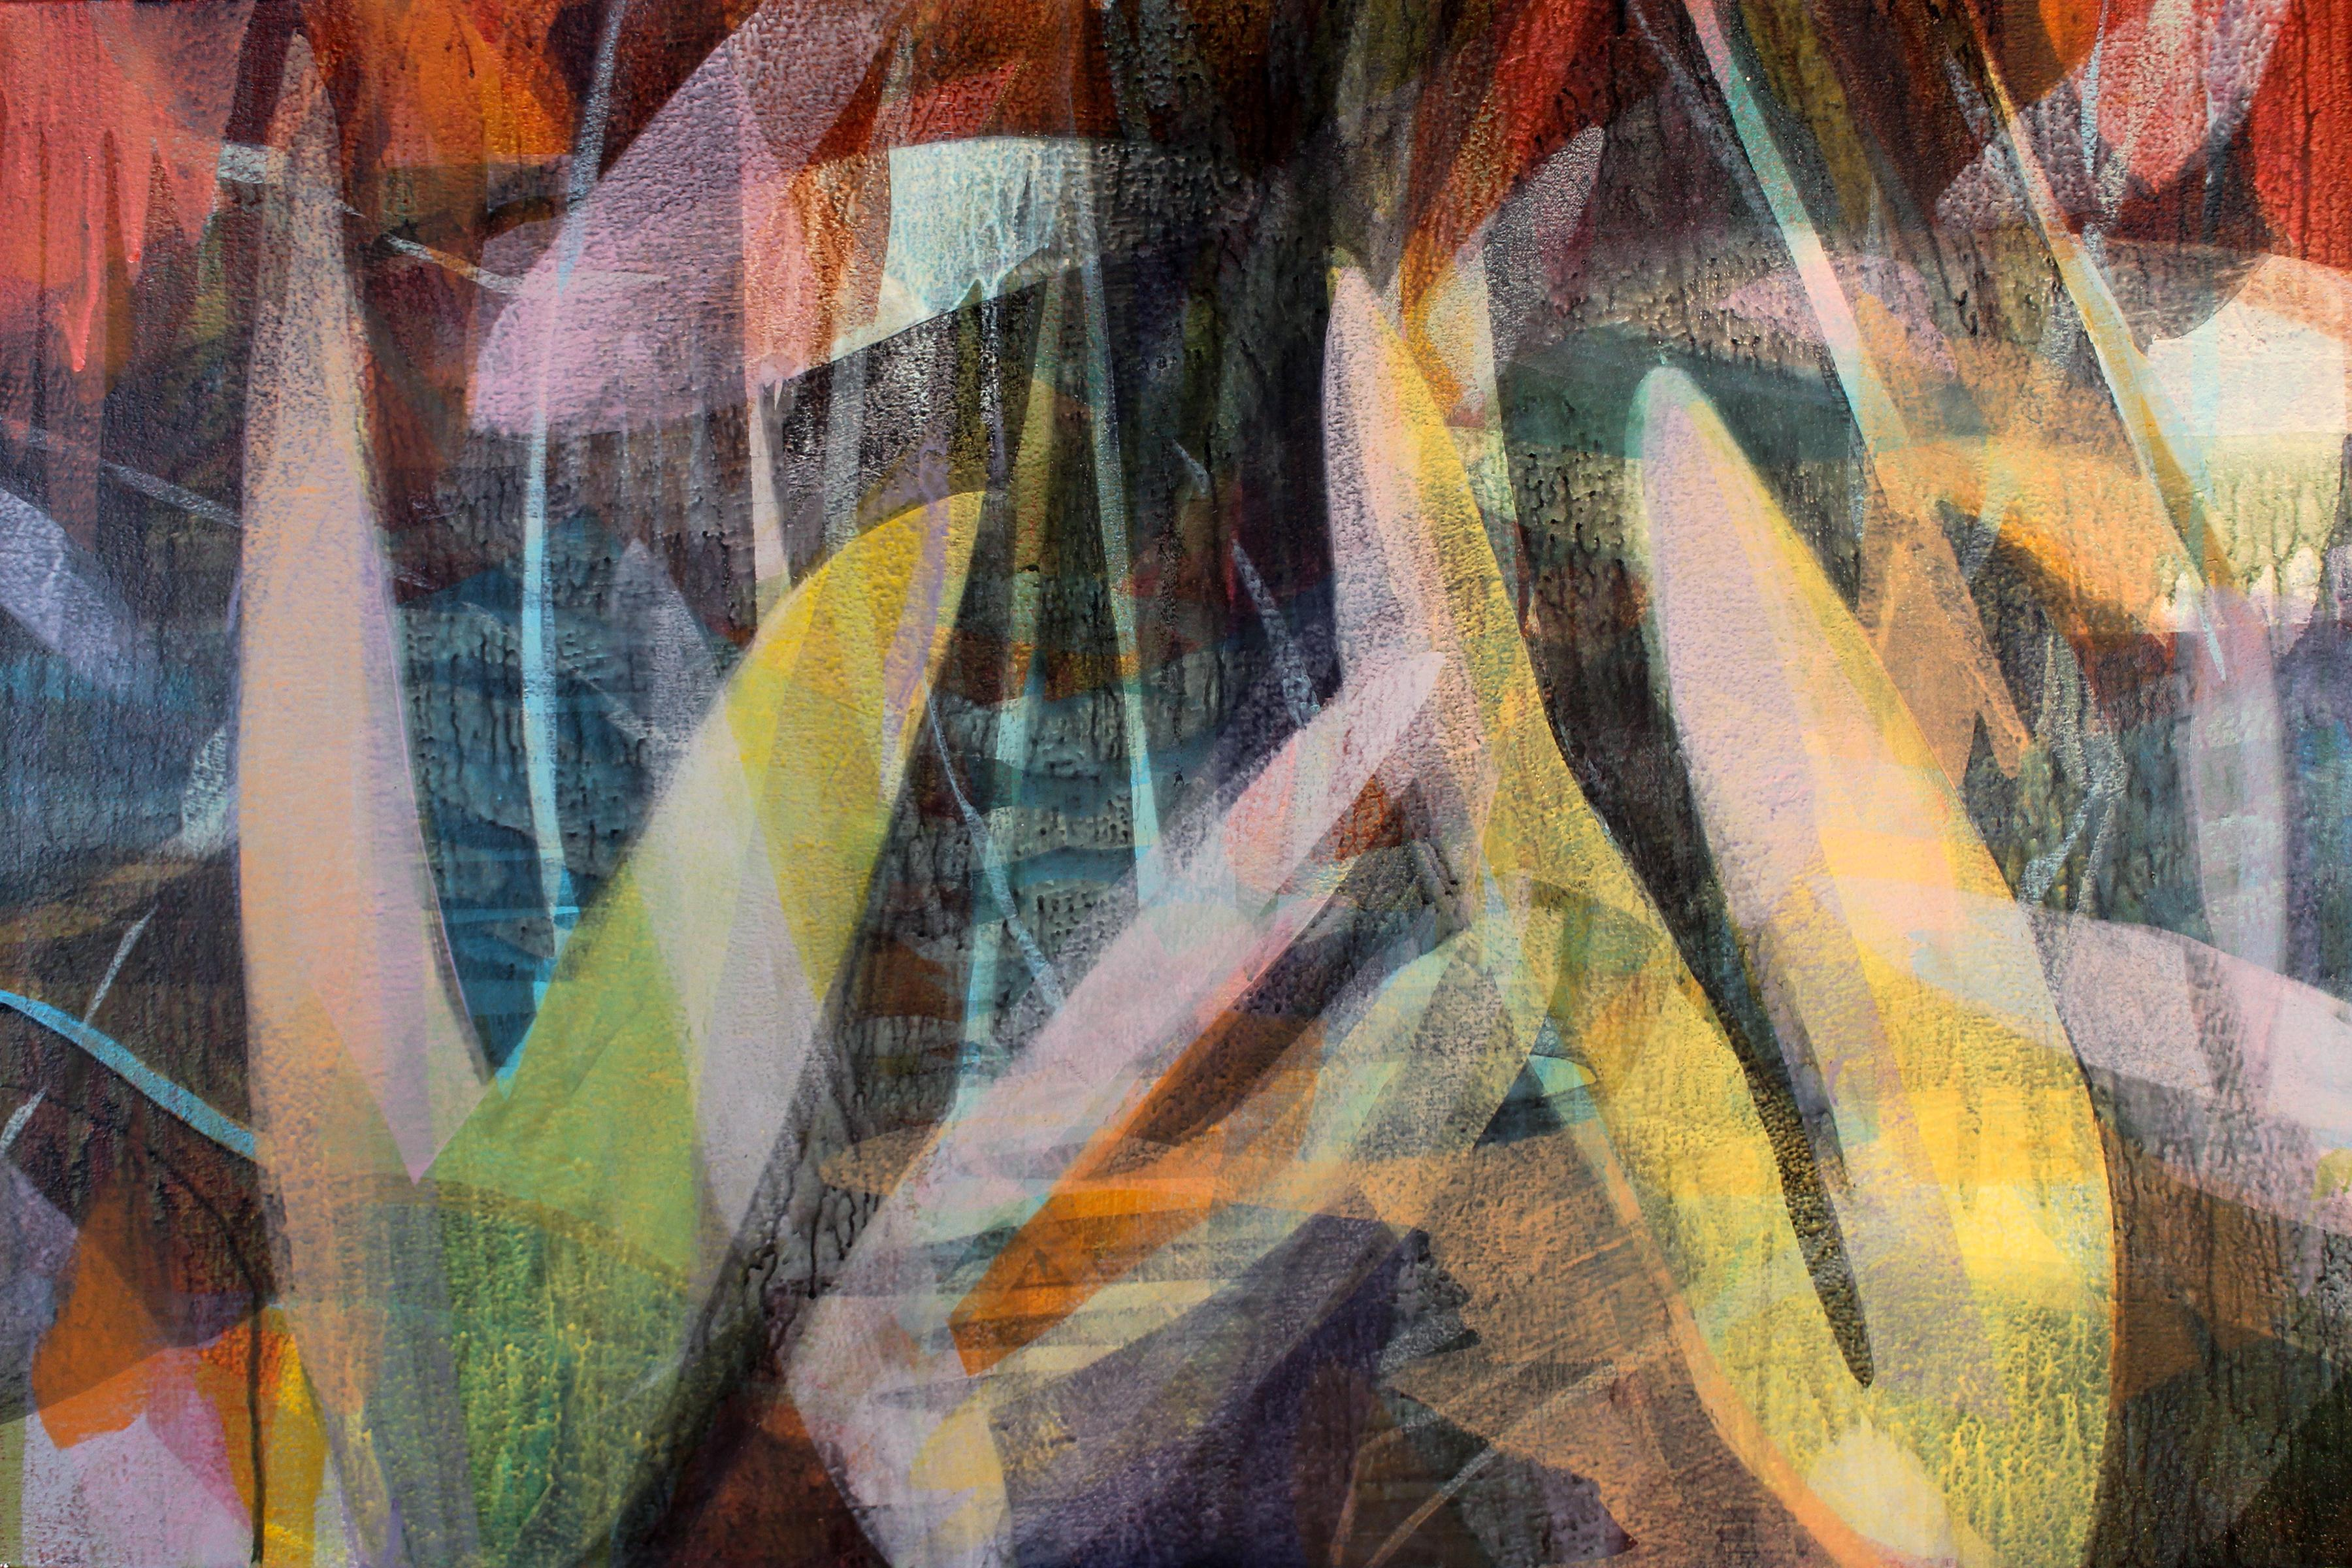 """(sequoia) ditch gazer no. 1"" - colorful abstract landscape - marsh - Diebenkorn"